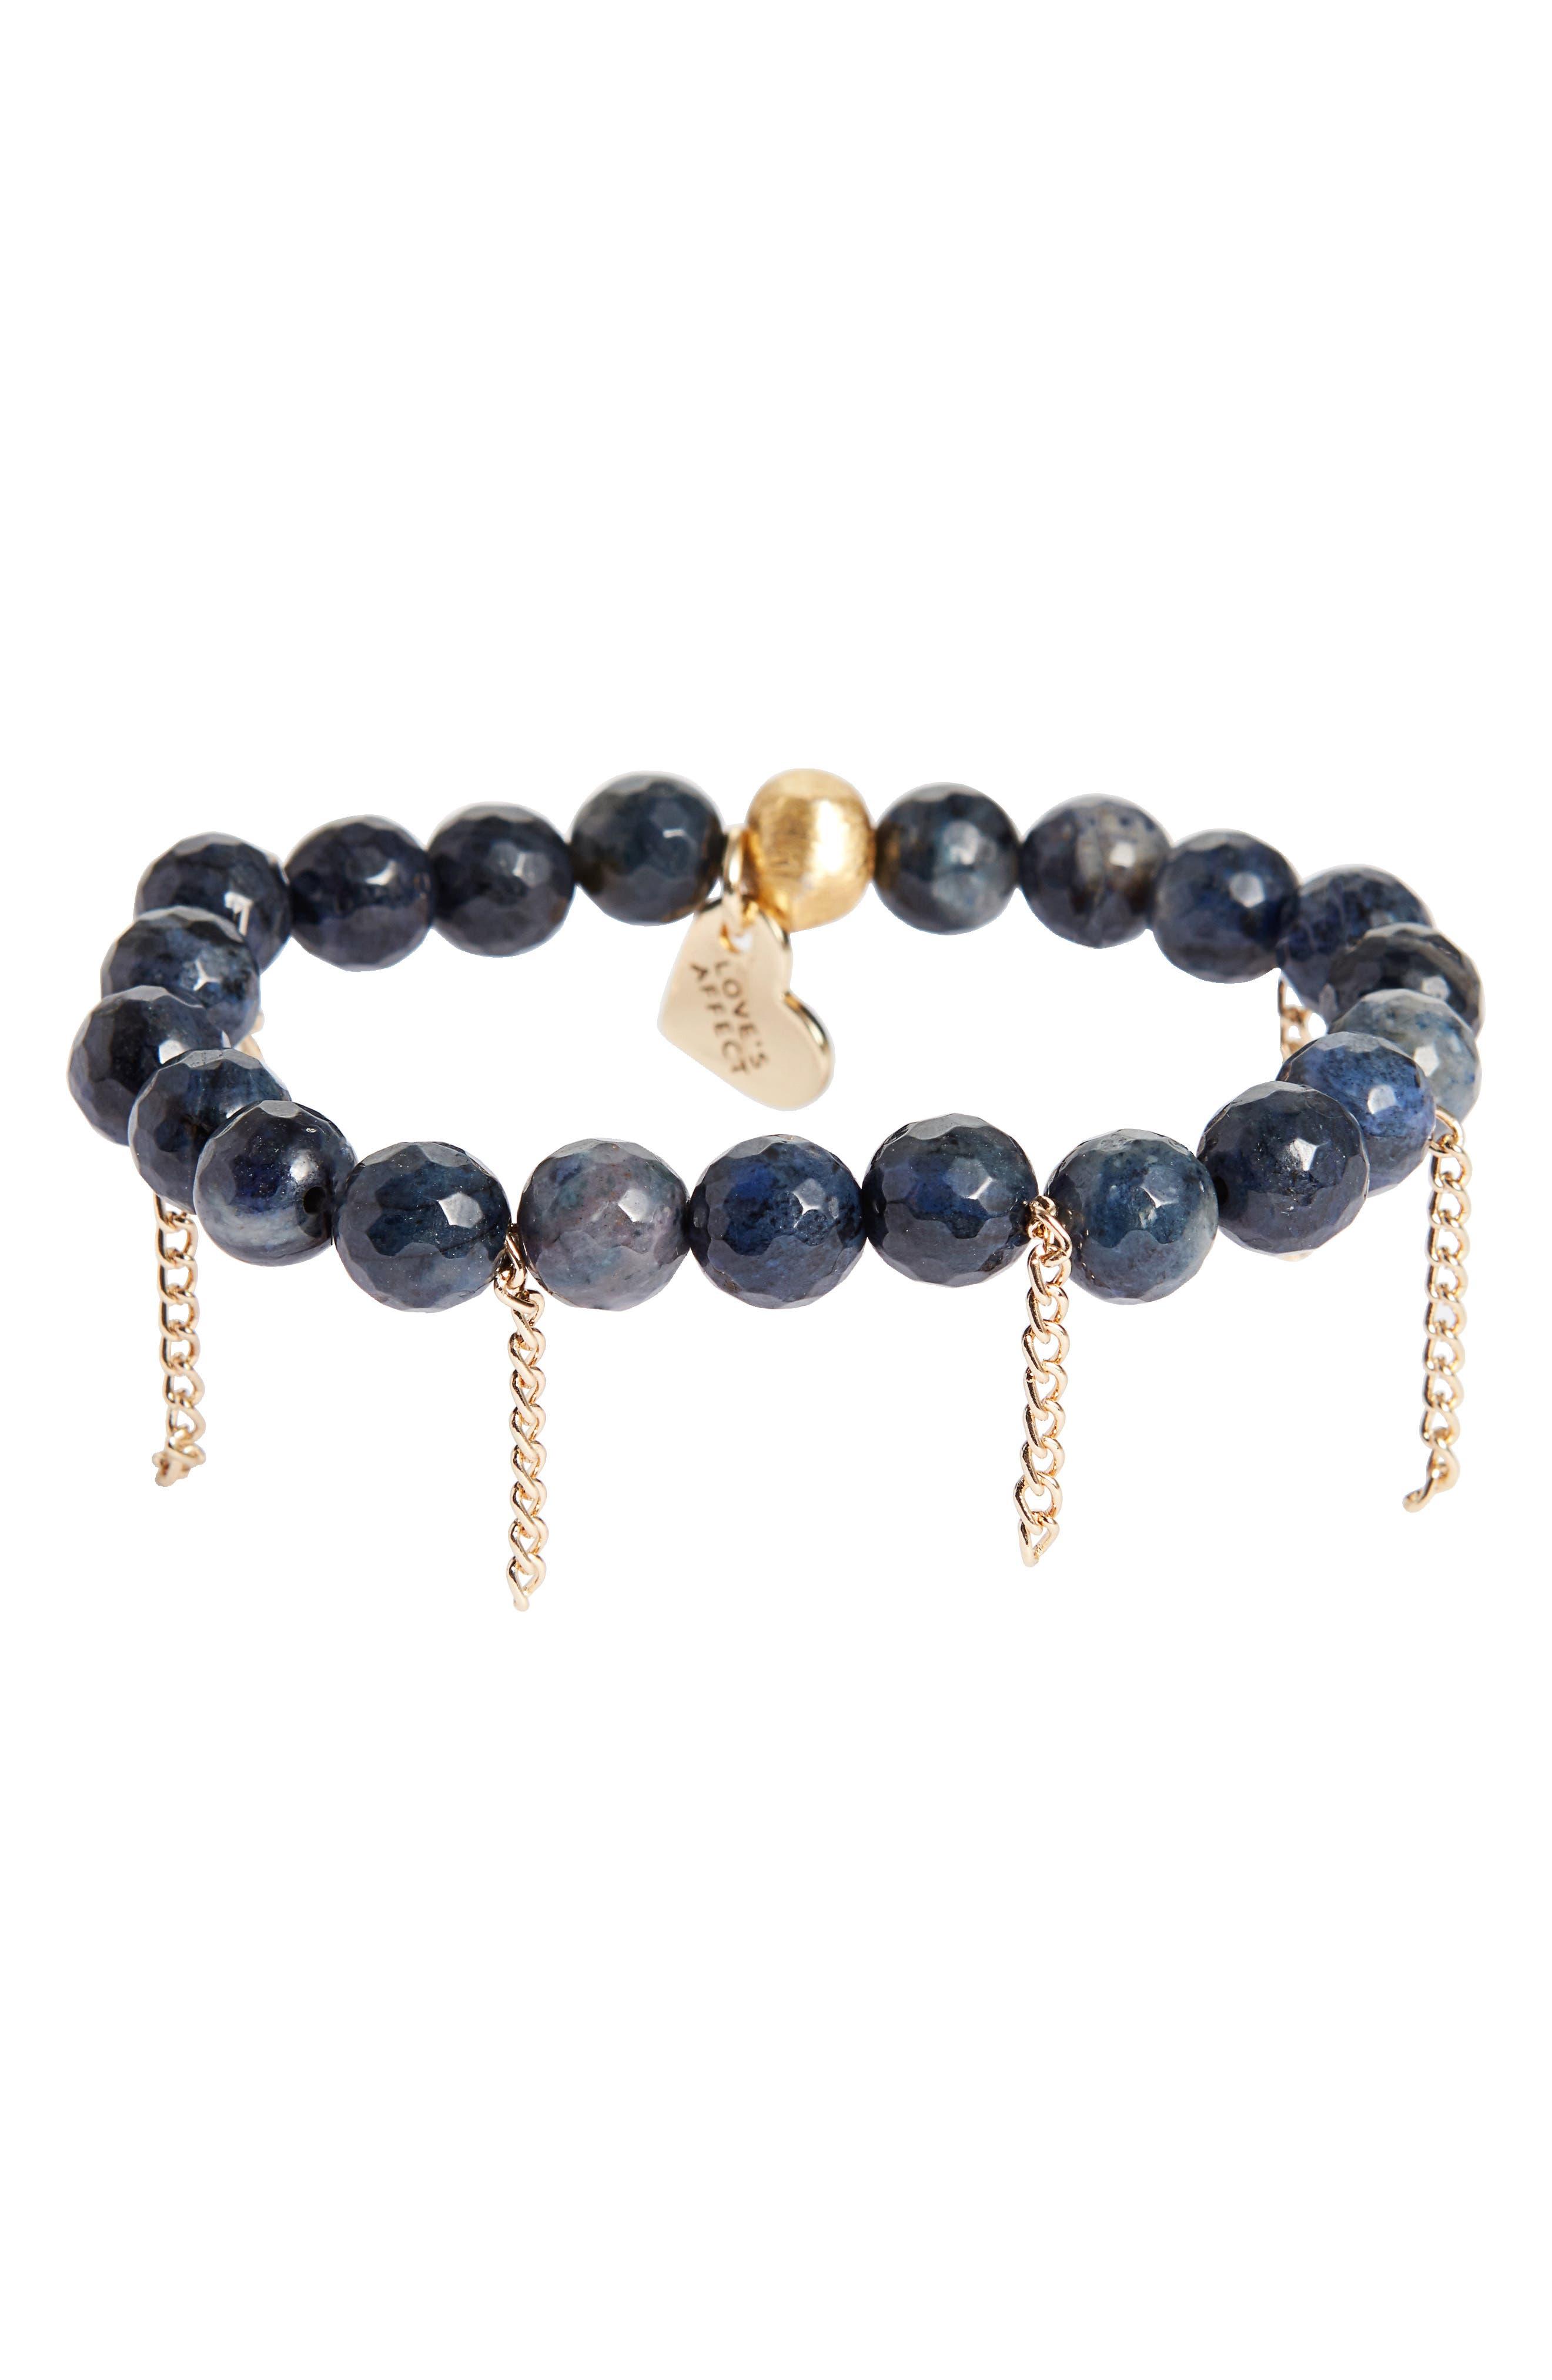 Main Image - Love's Affect Devyn Semiprecious Stretch Bracelet